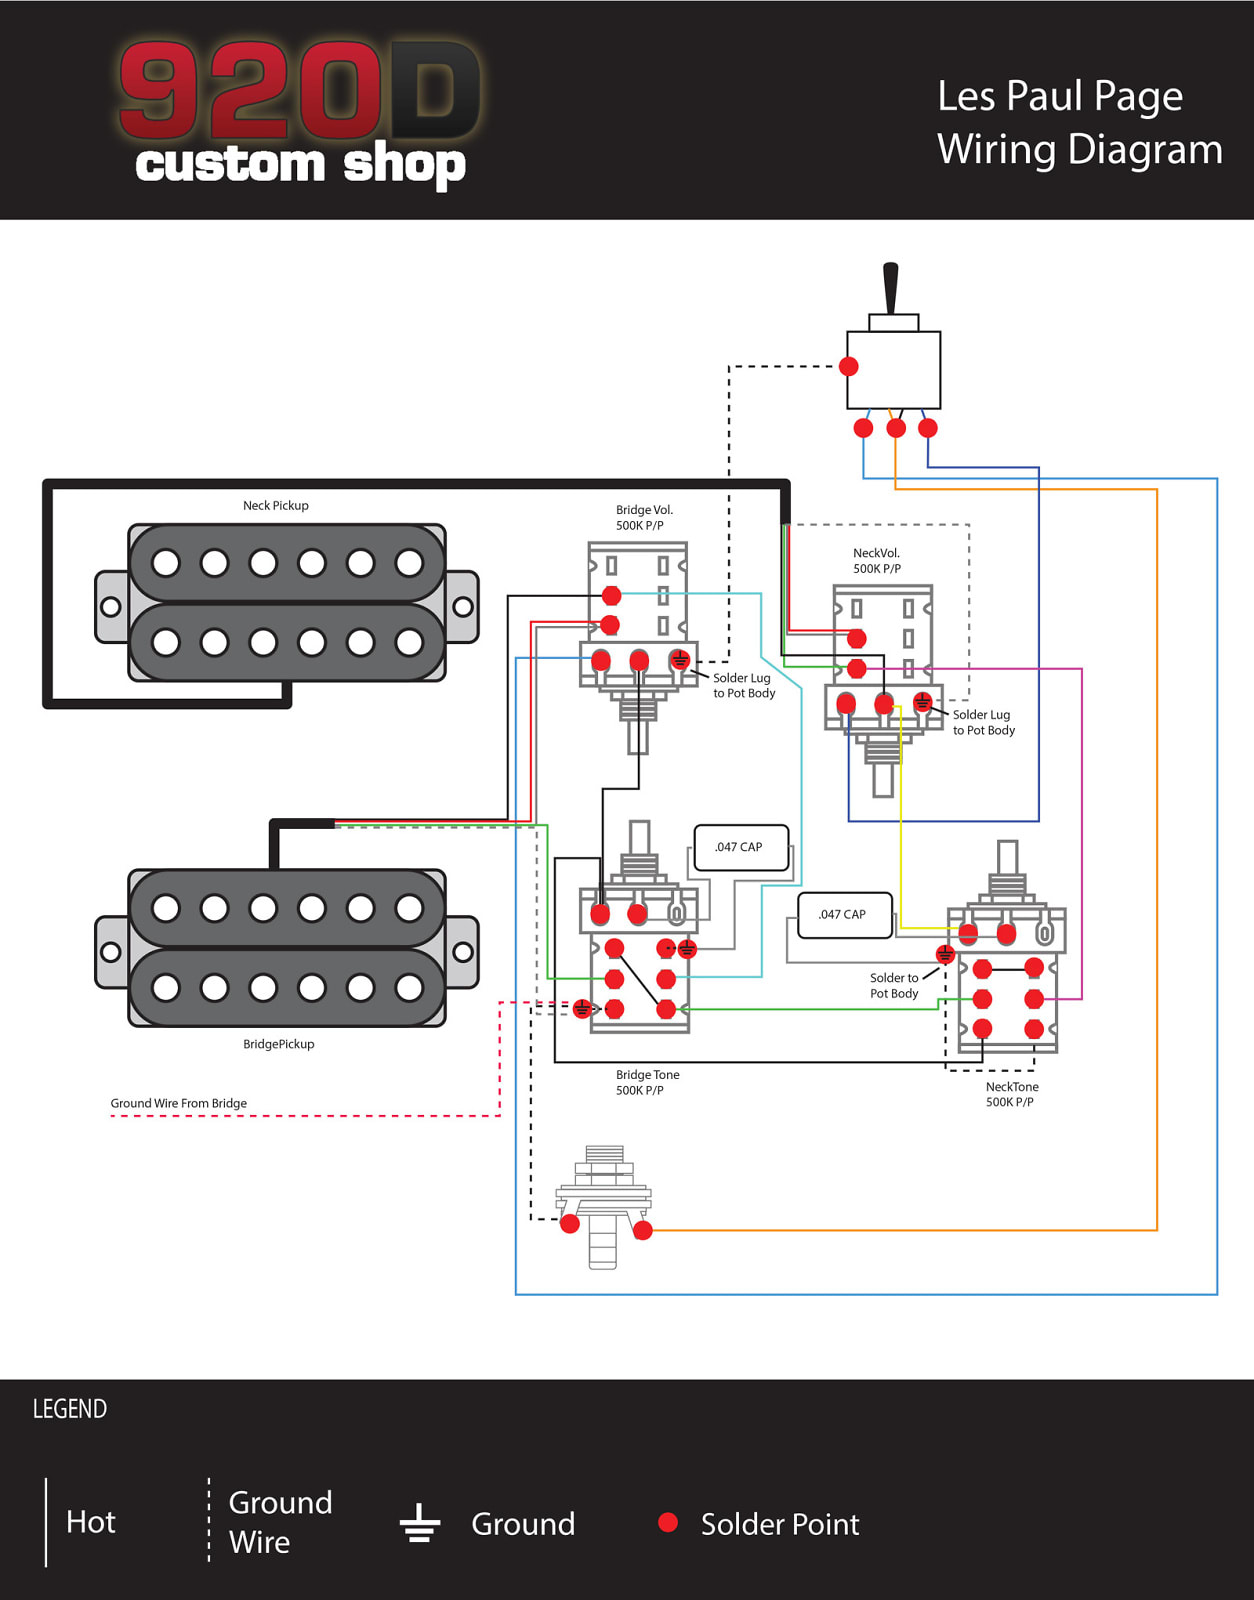 Jackson J80c Wiring Diagram - Search For Wiring Diagrams •